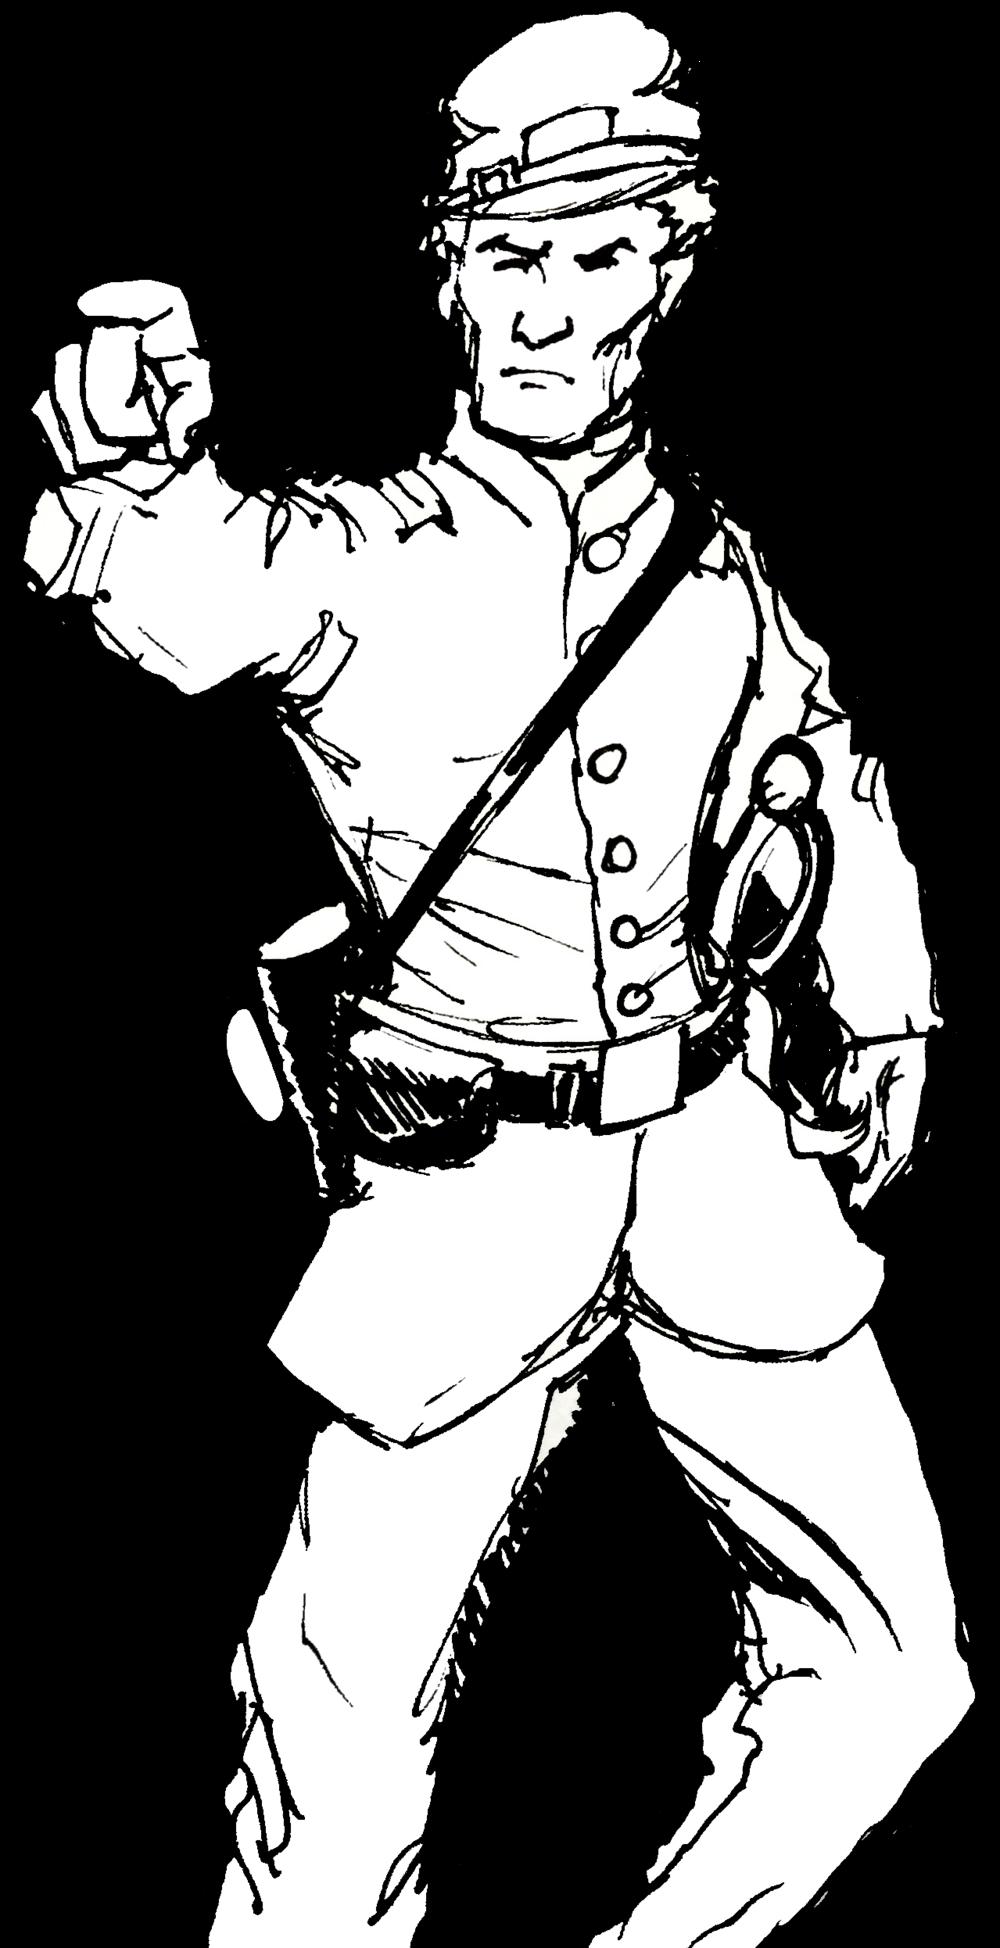 graphic Civil War Soldier Drawing at GetDrawings